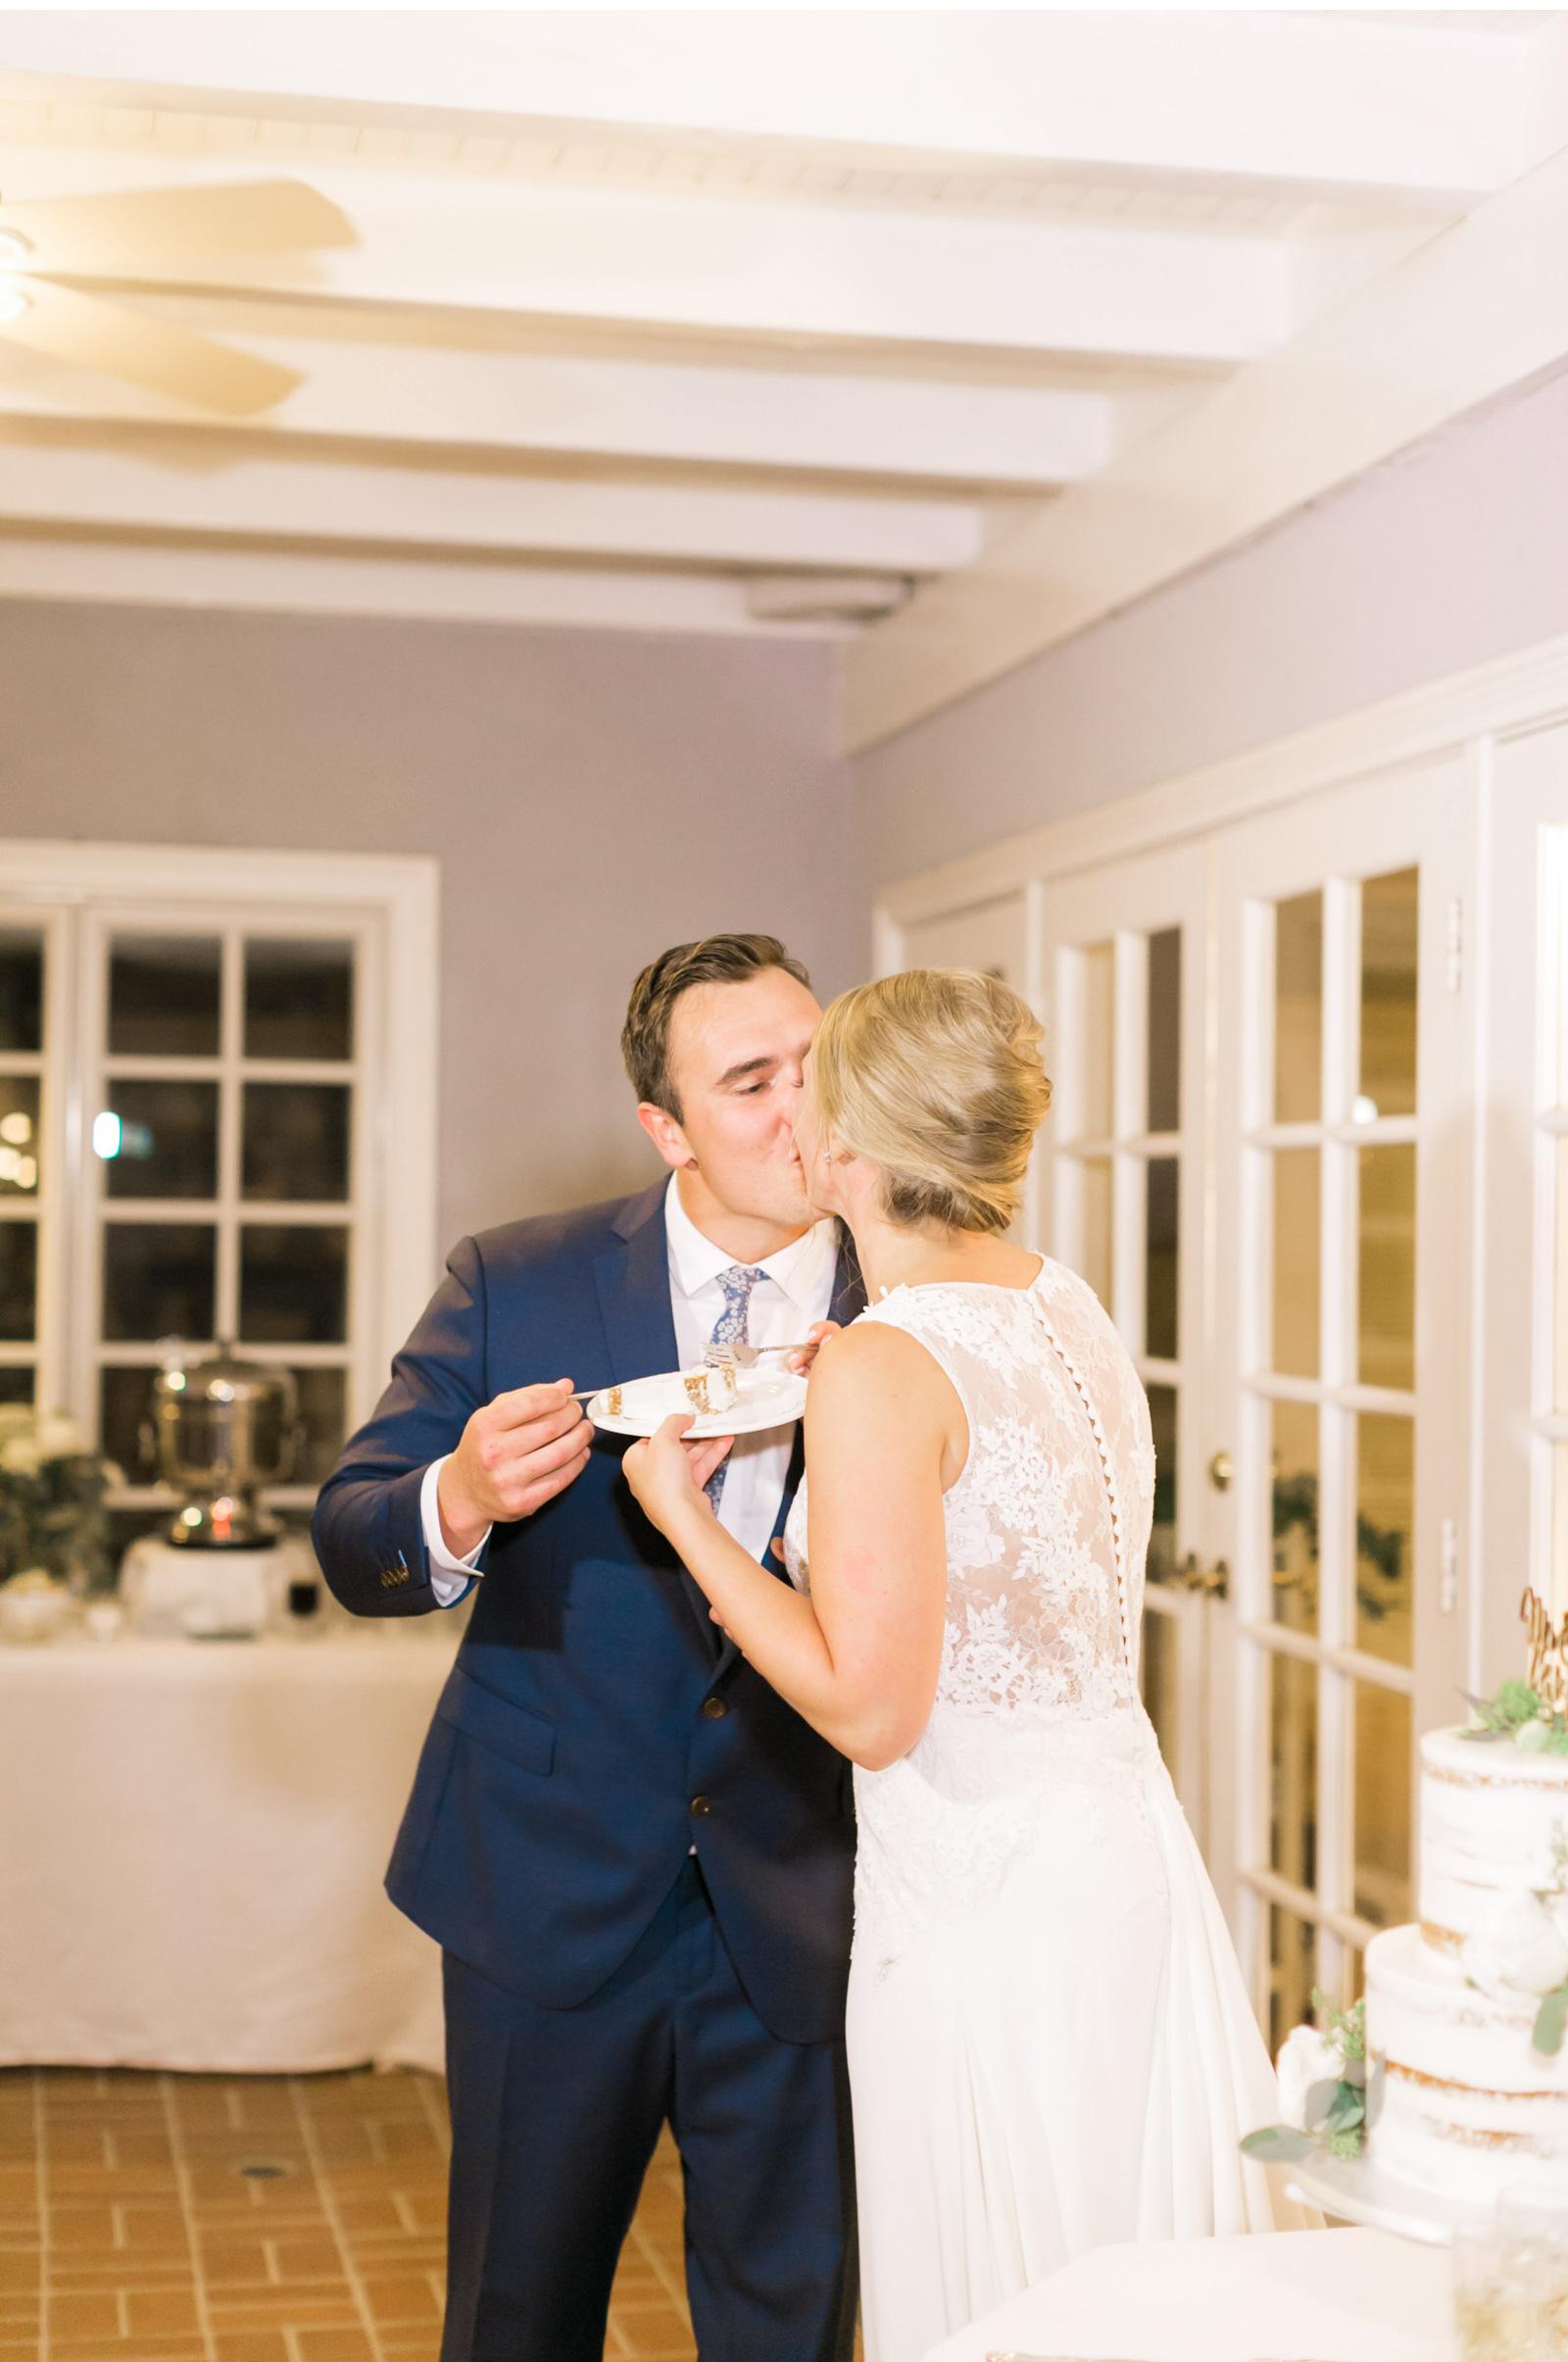 Southern-California-Wedding-Photographer-Natalie-Schutt-Photography_11.jpg